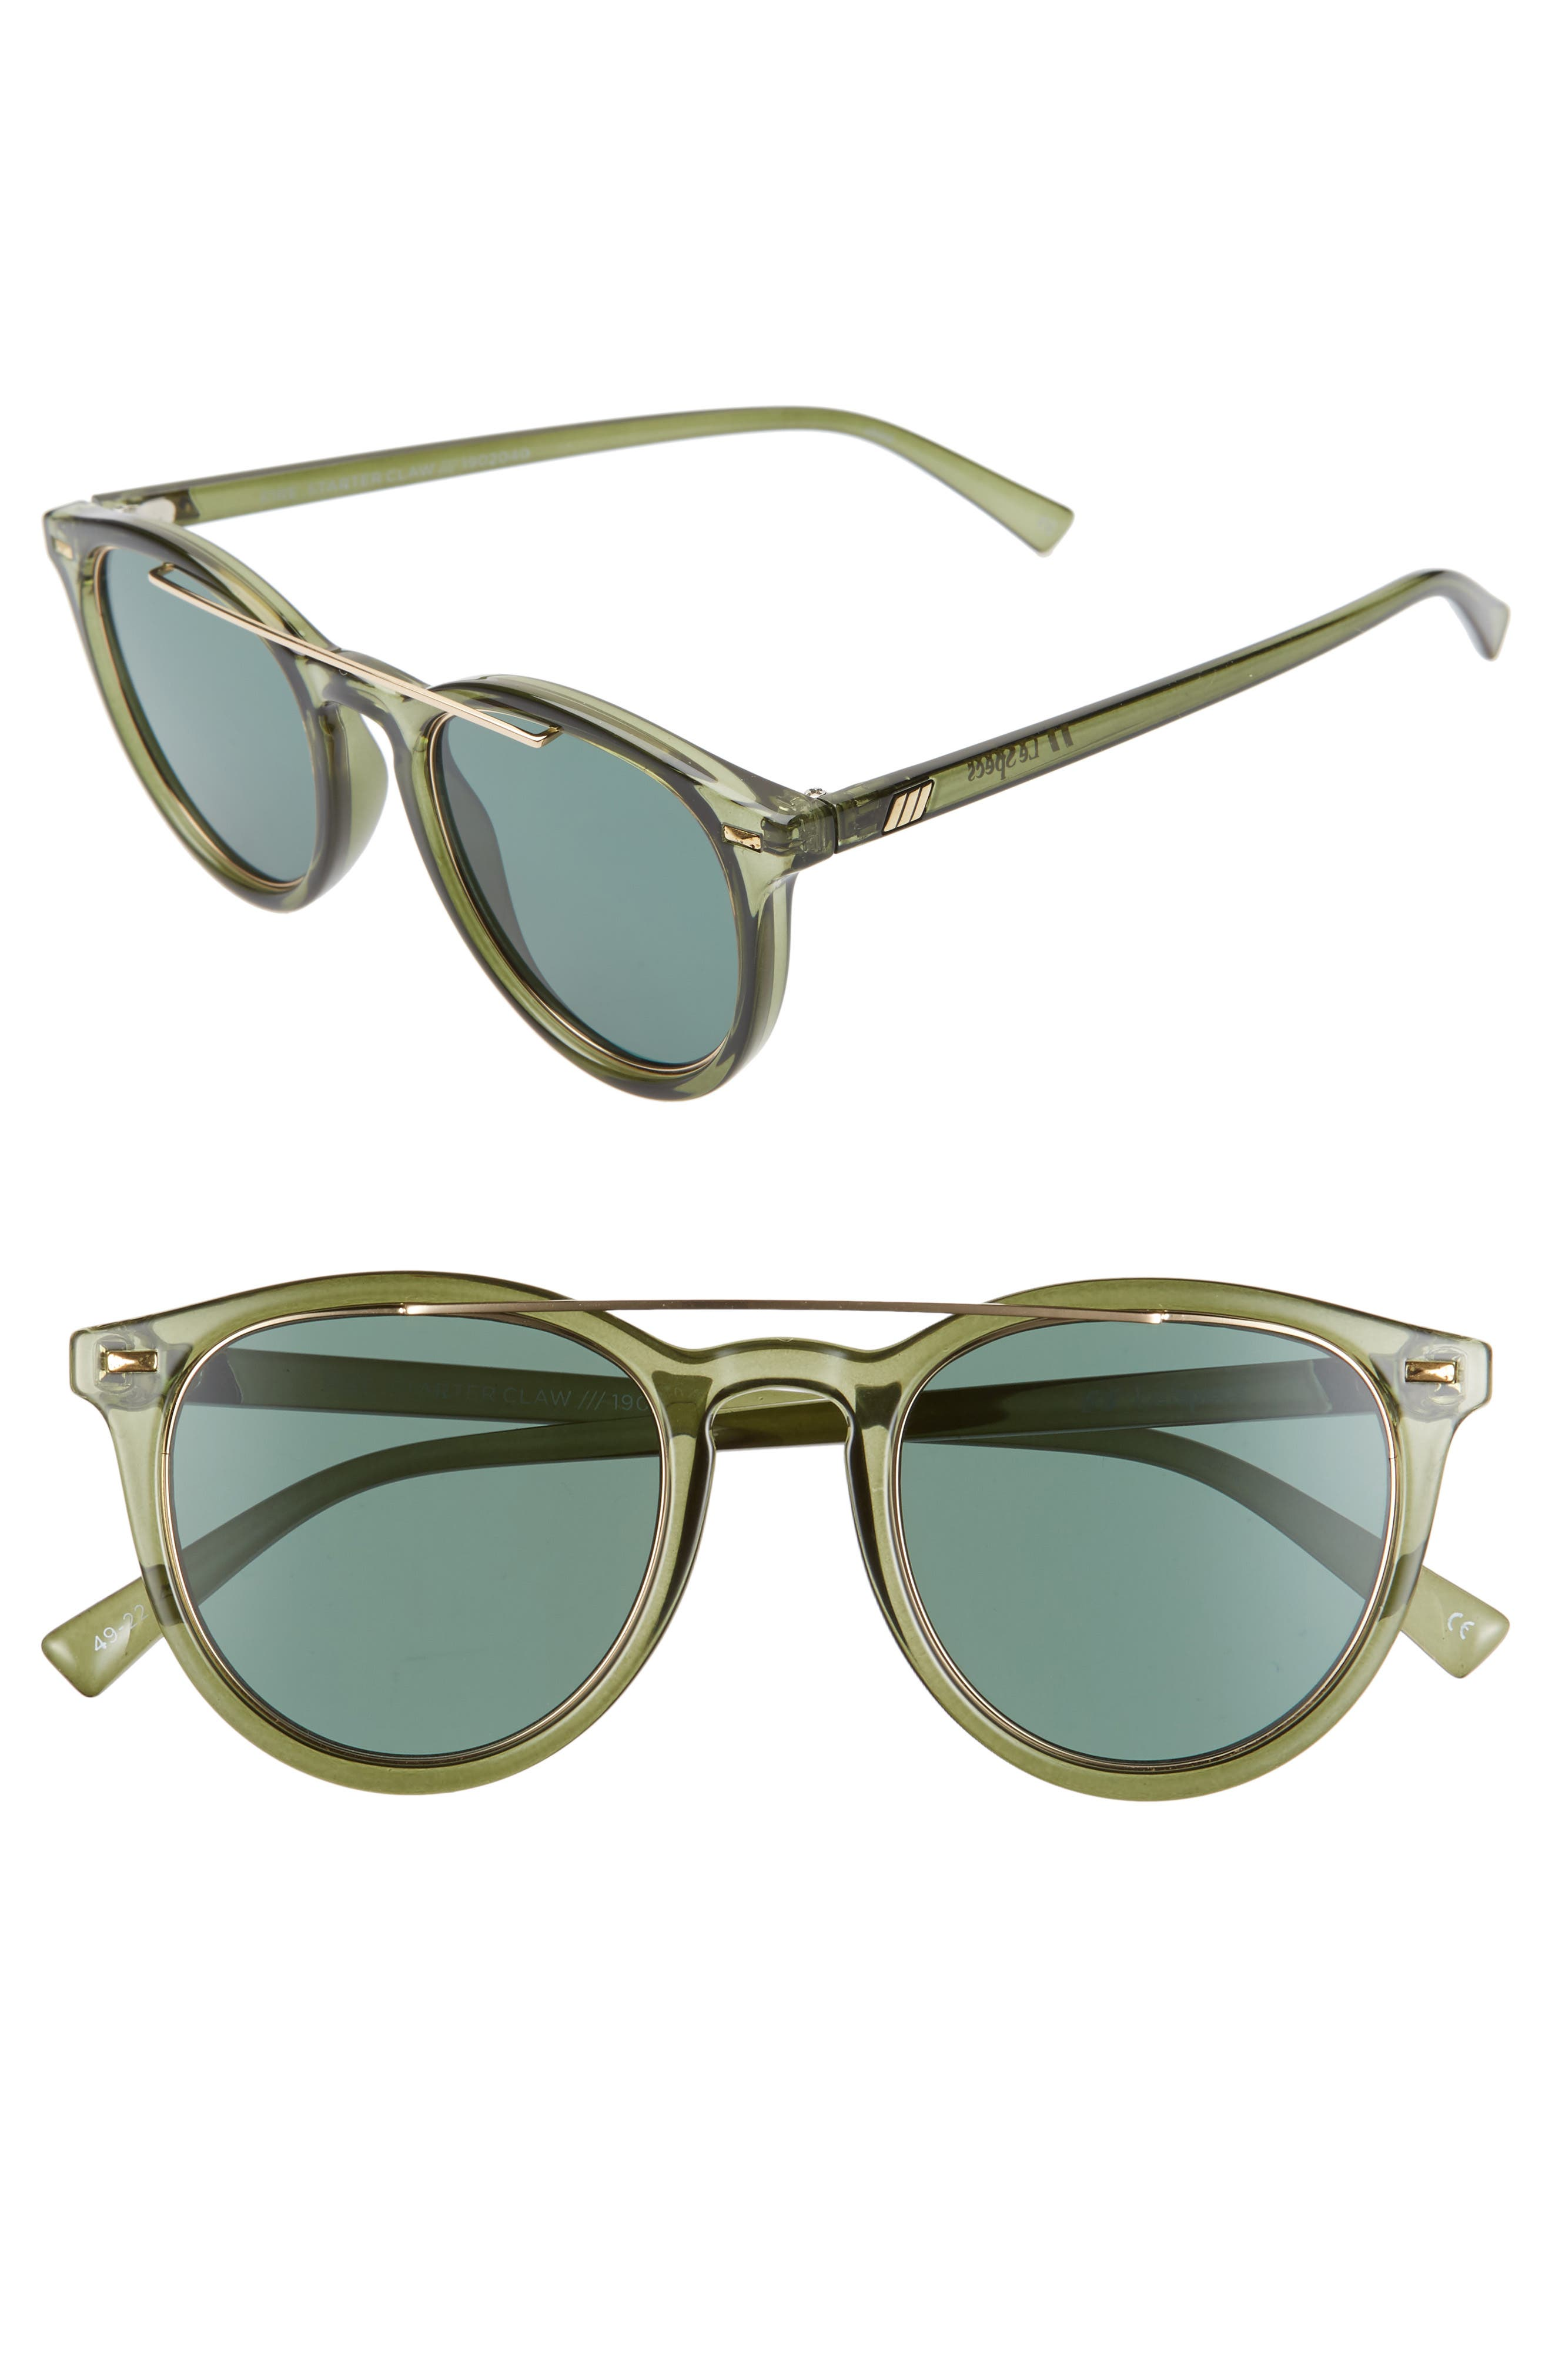 Le Specs Fire Starter 4m Round Sunglasses - Transparent Khaki